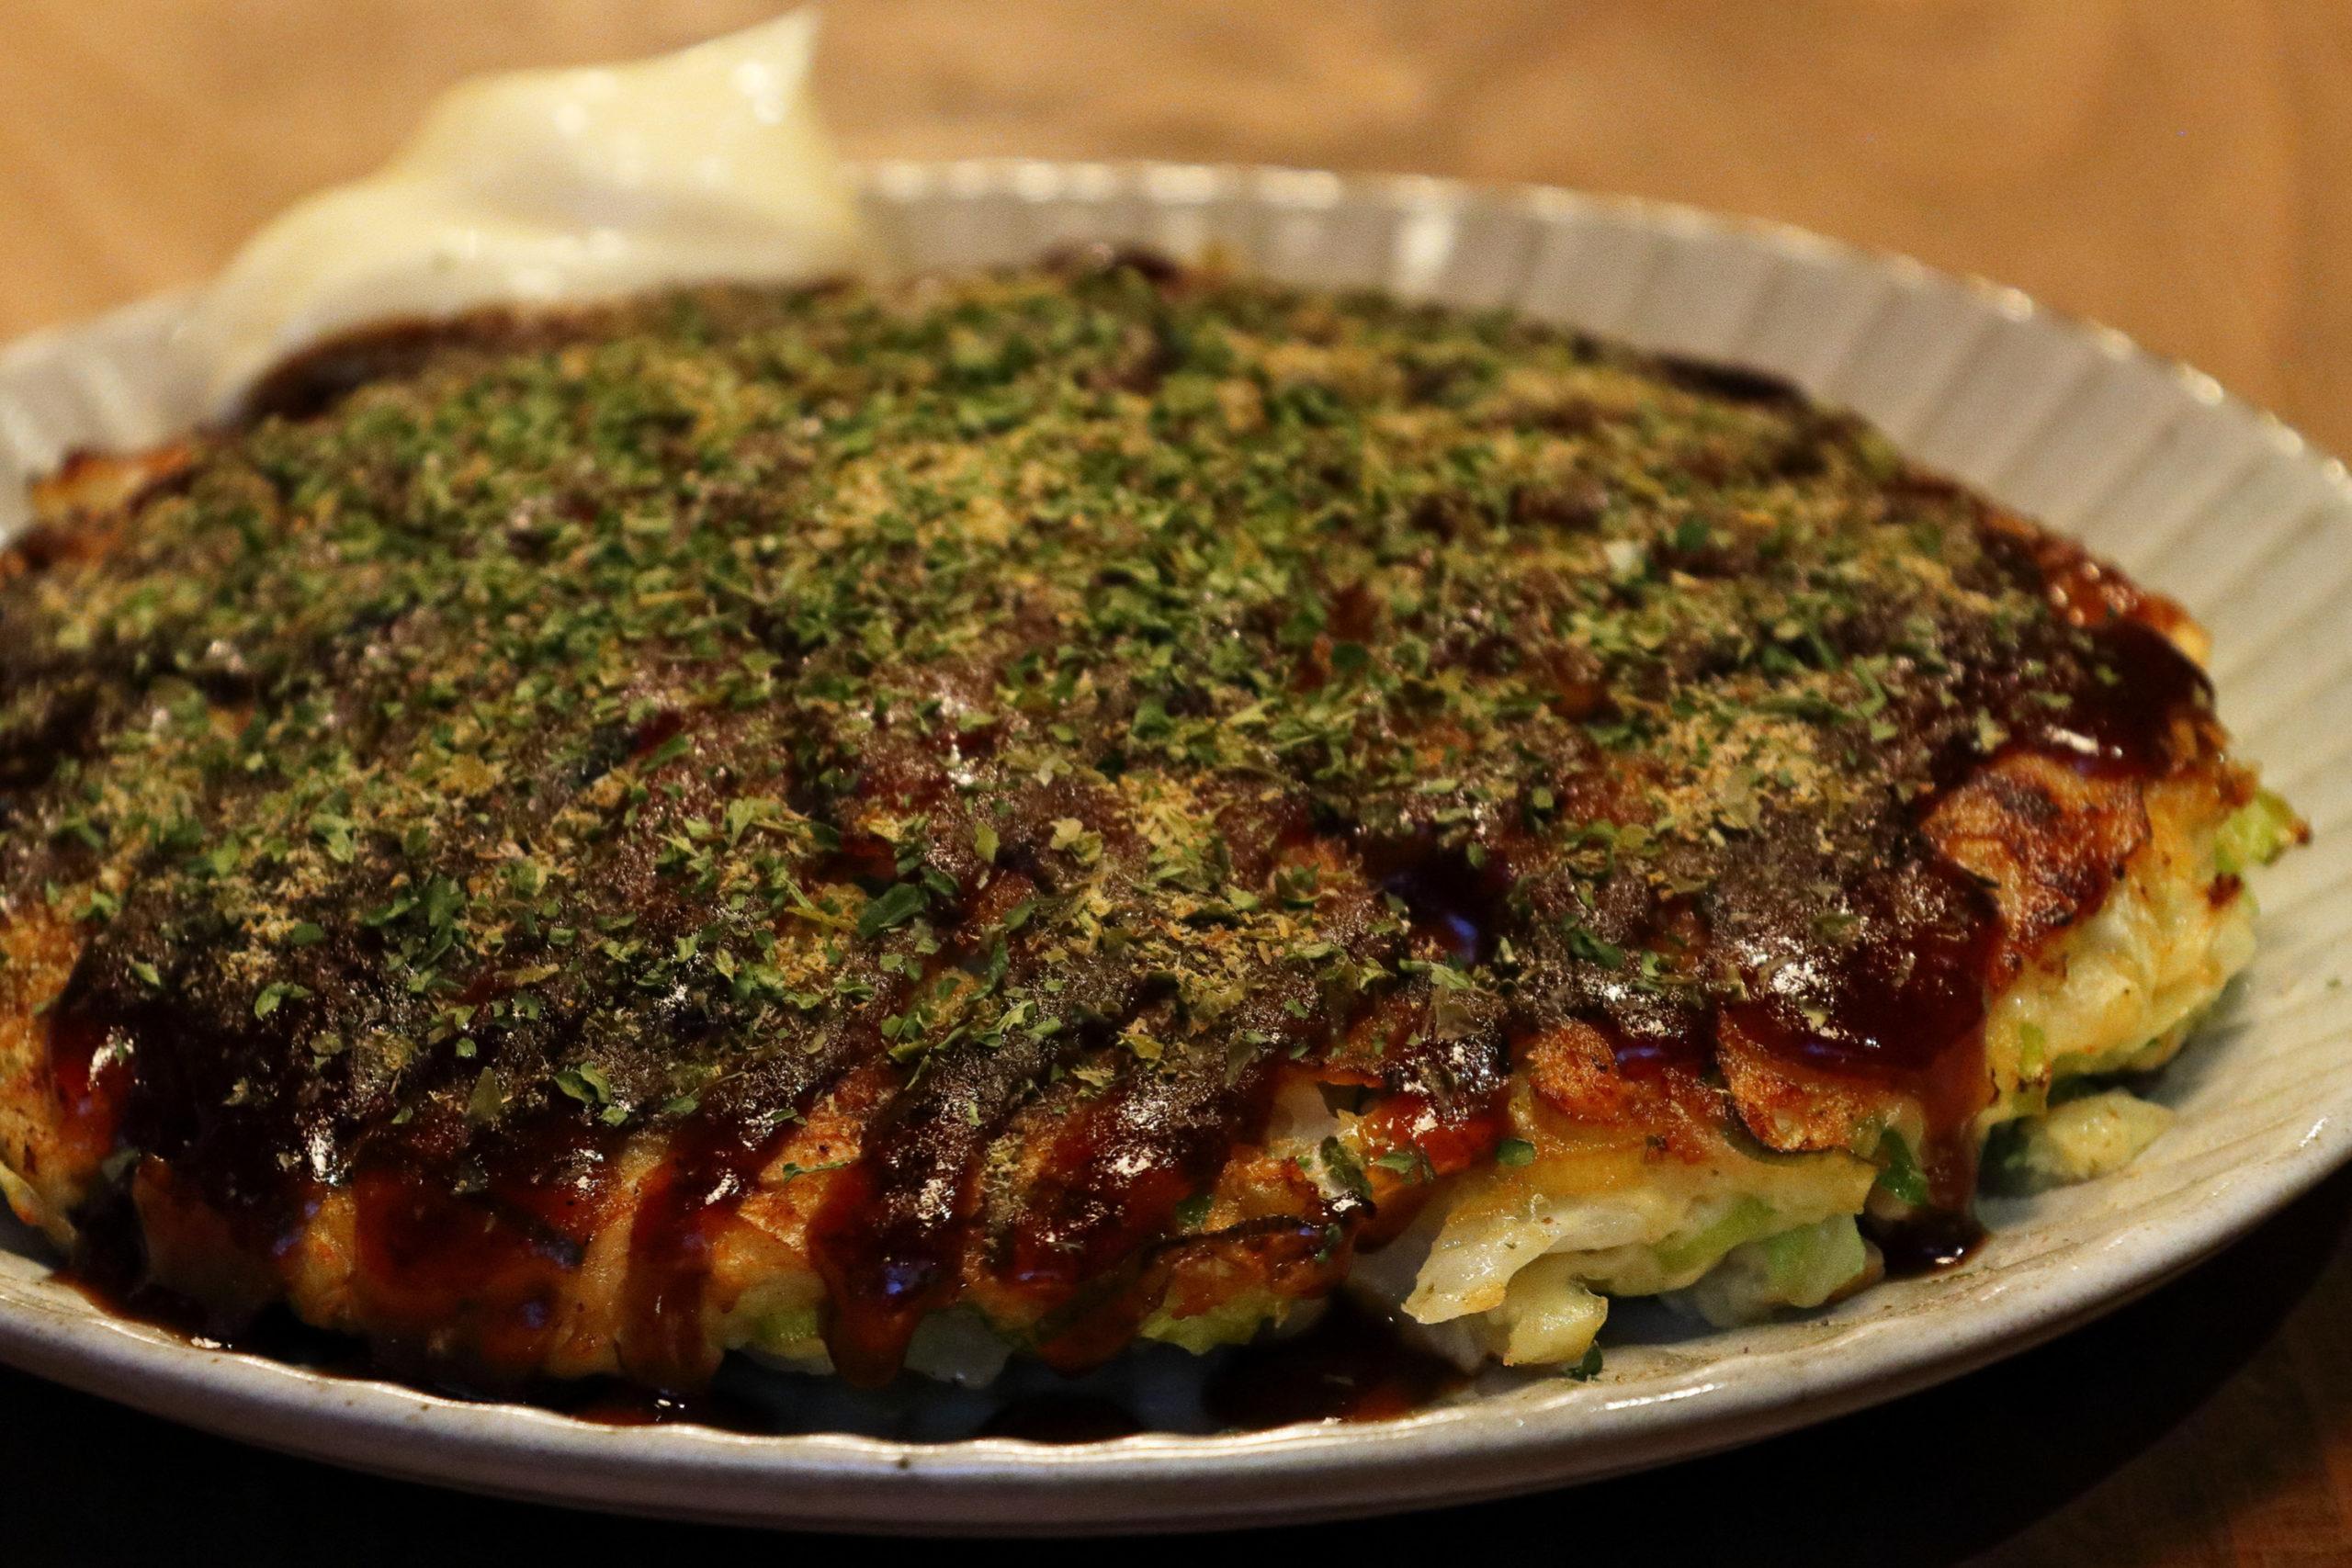 https://www.milkbar.jp/wp/wp-content/uploads/2020/08/food_okonomiyaki-scaled.jpg